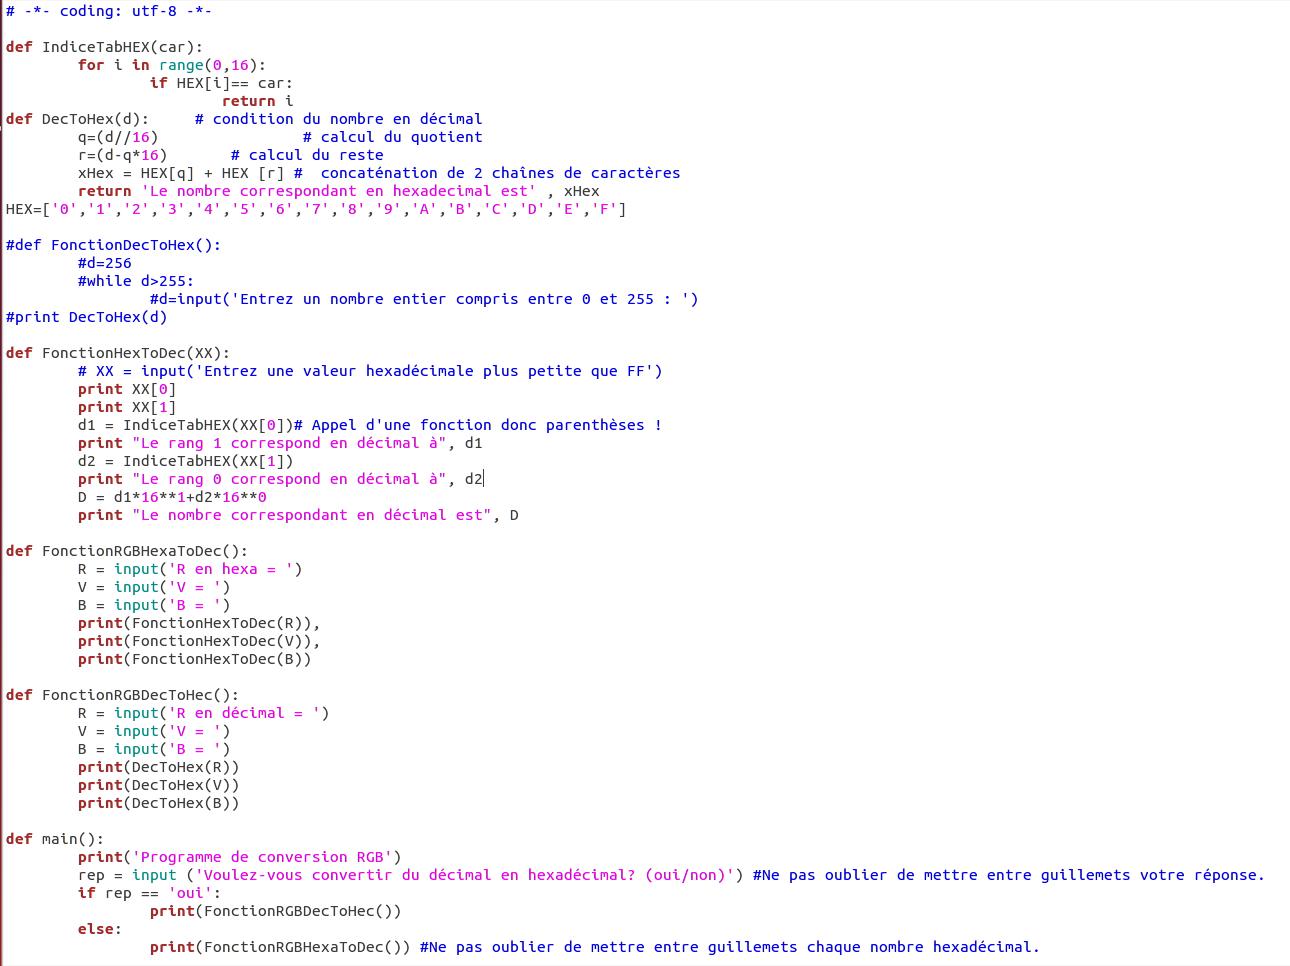 Programmation Python : convertisseur RGB hexadécimal avec